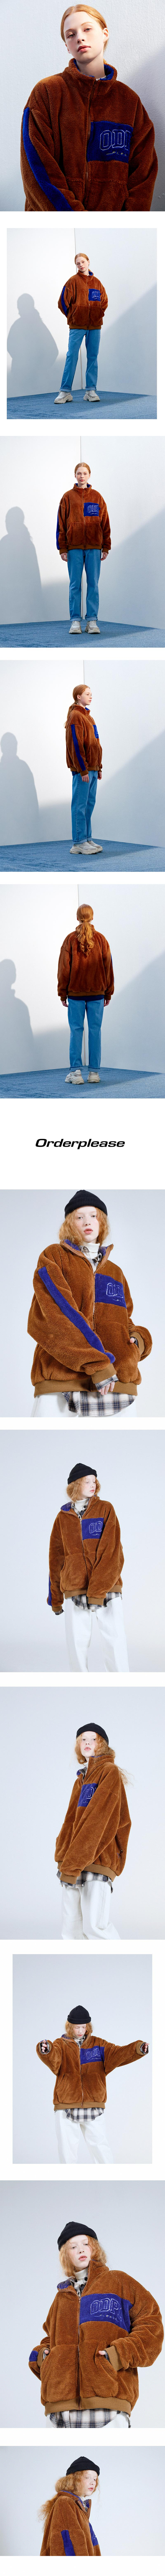 odpl-fur-jk-brown02.jpg